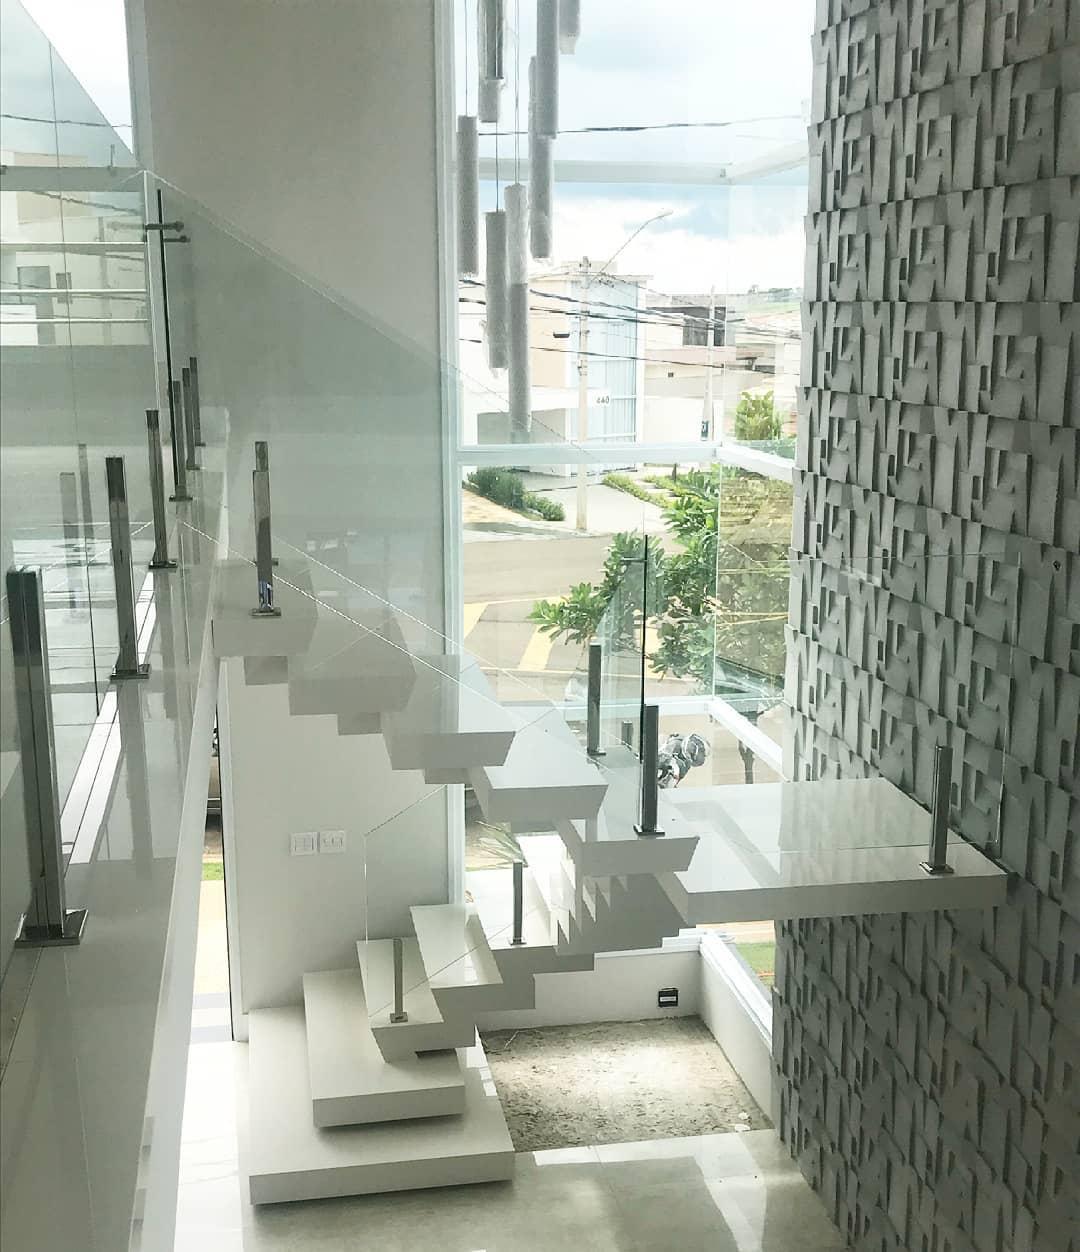 guarda-corpo de vidro em escada clean